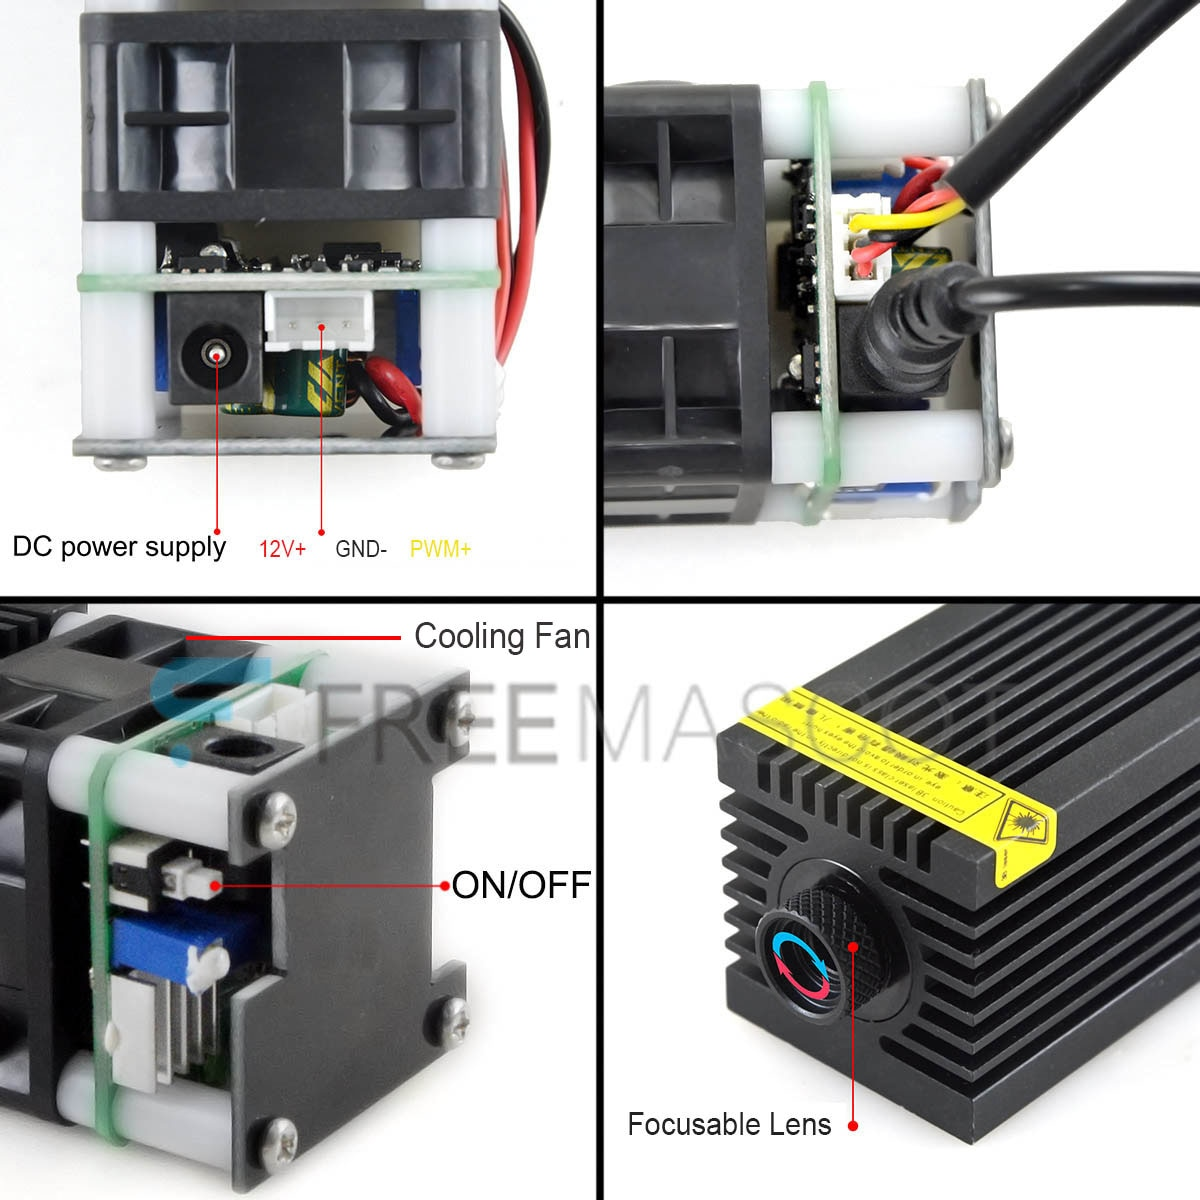 CWLASER 100mW 1.6W 3W 5W Blue Laser Module for DIY Laser Engraver Laser Head with 12V and PWM Control (Black) enlarge